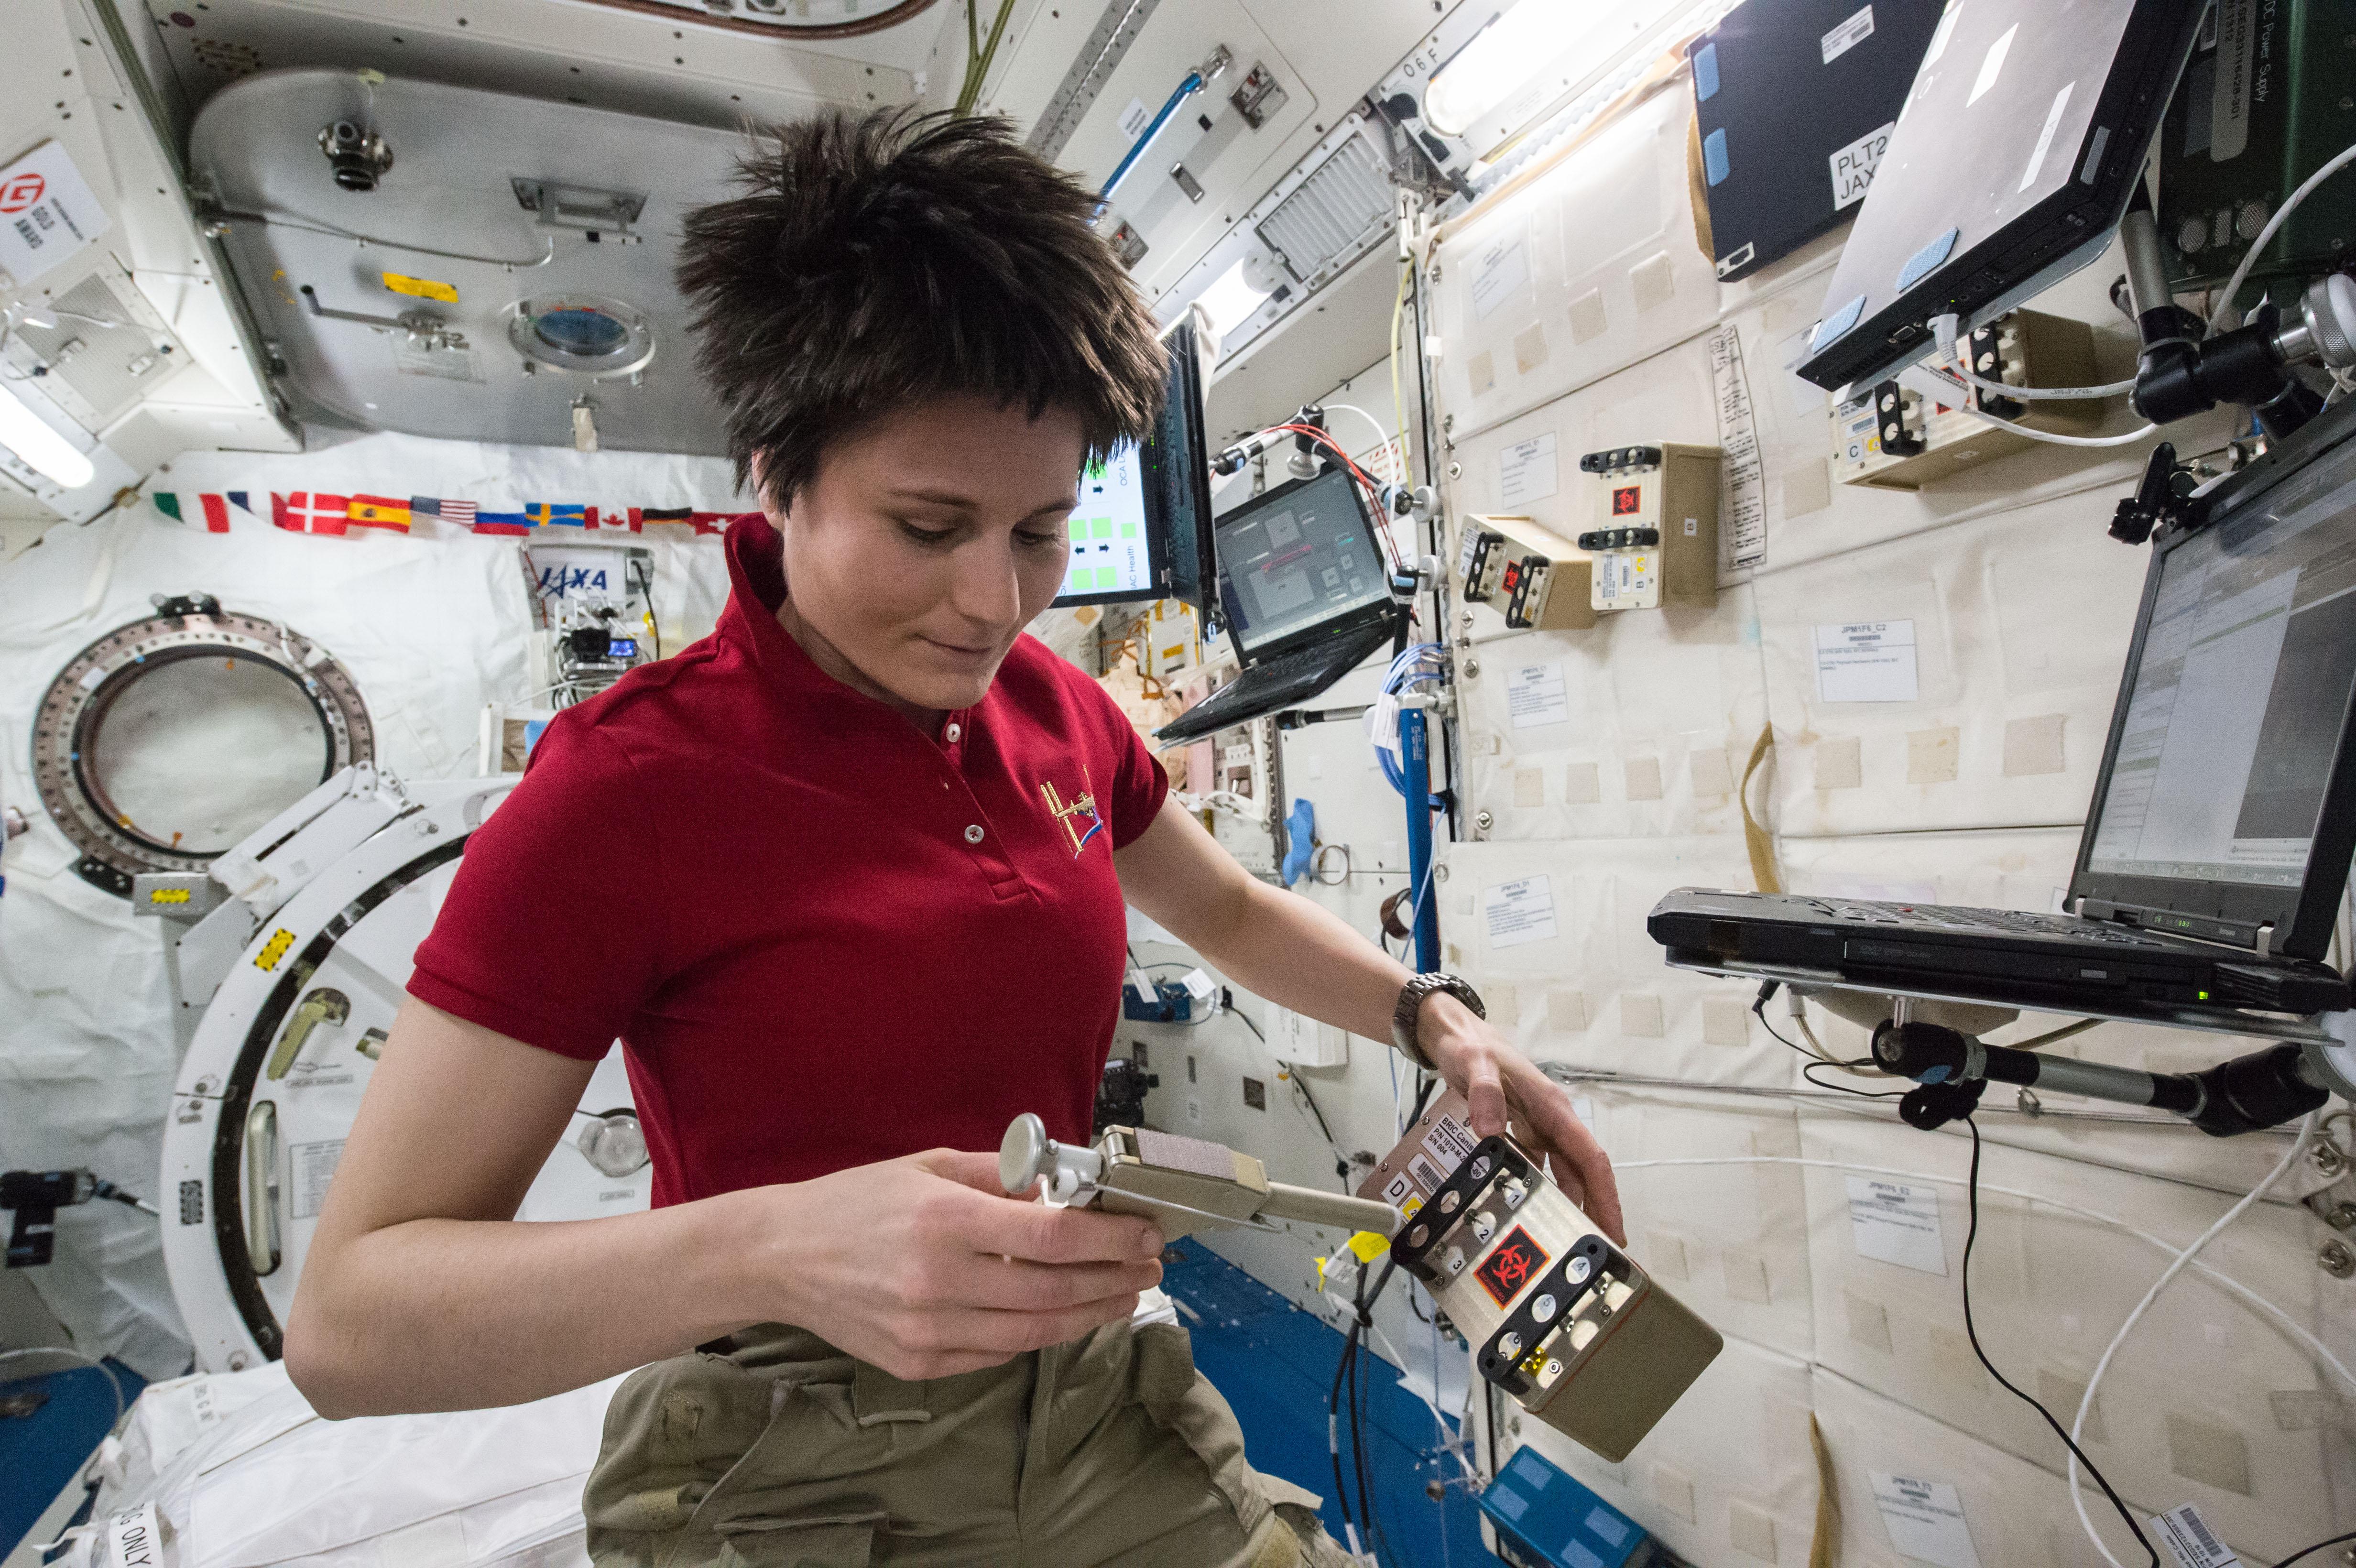 Fileiss 43 Samantha Cristoforetti Unpacks Scientific Equipmentjpg